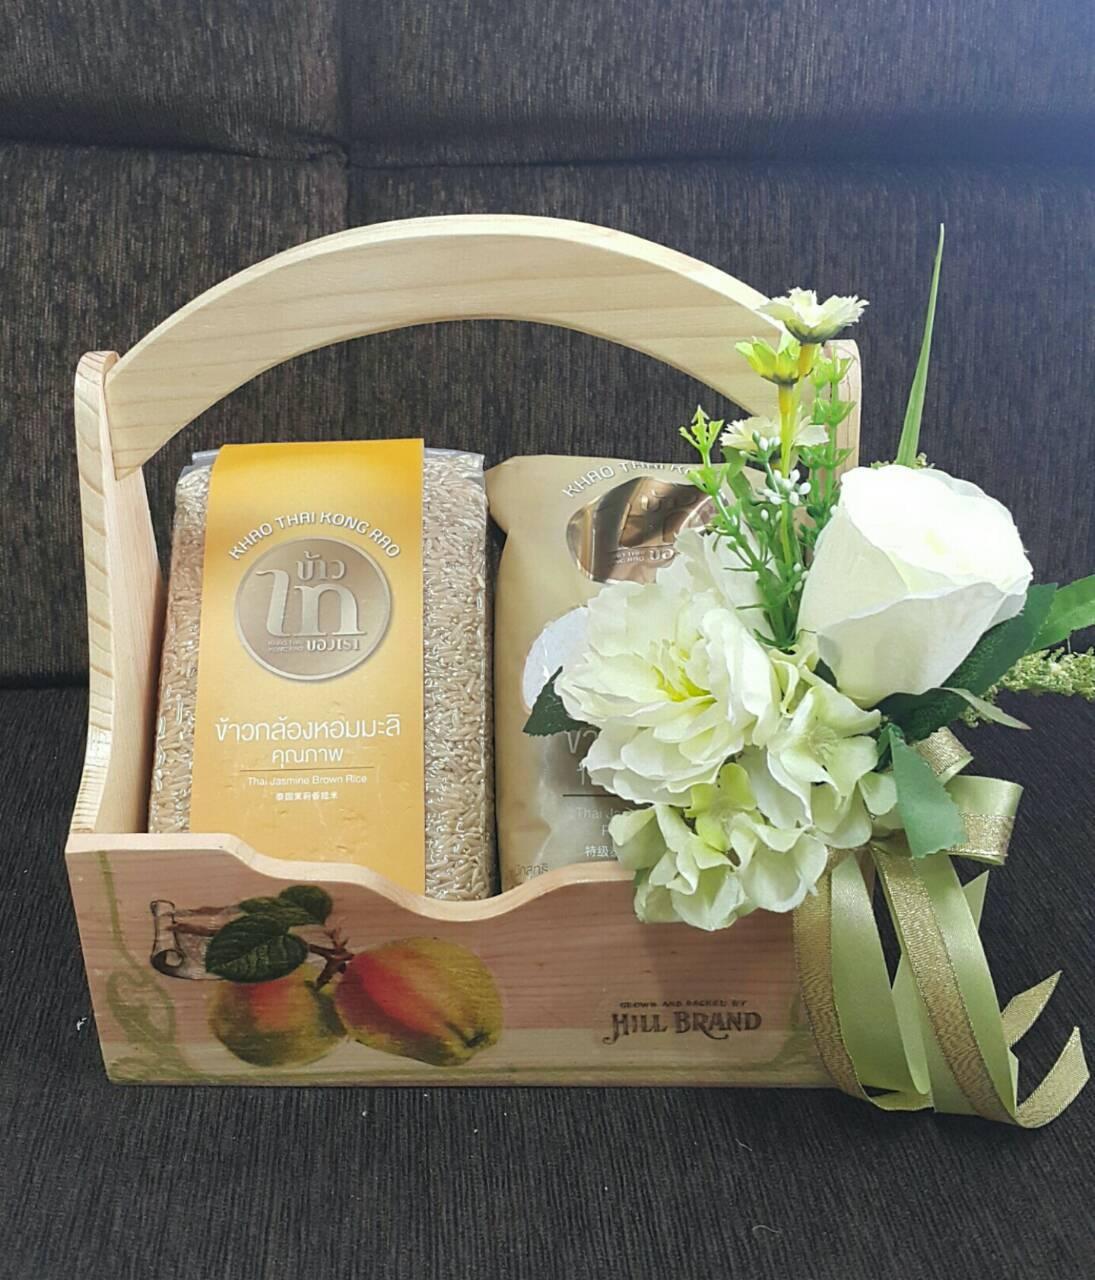 Flower-Hanabana กระเช้าของขวัญ